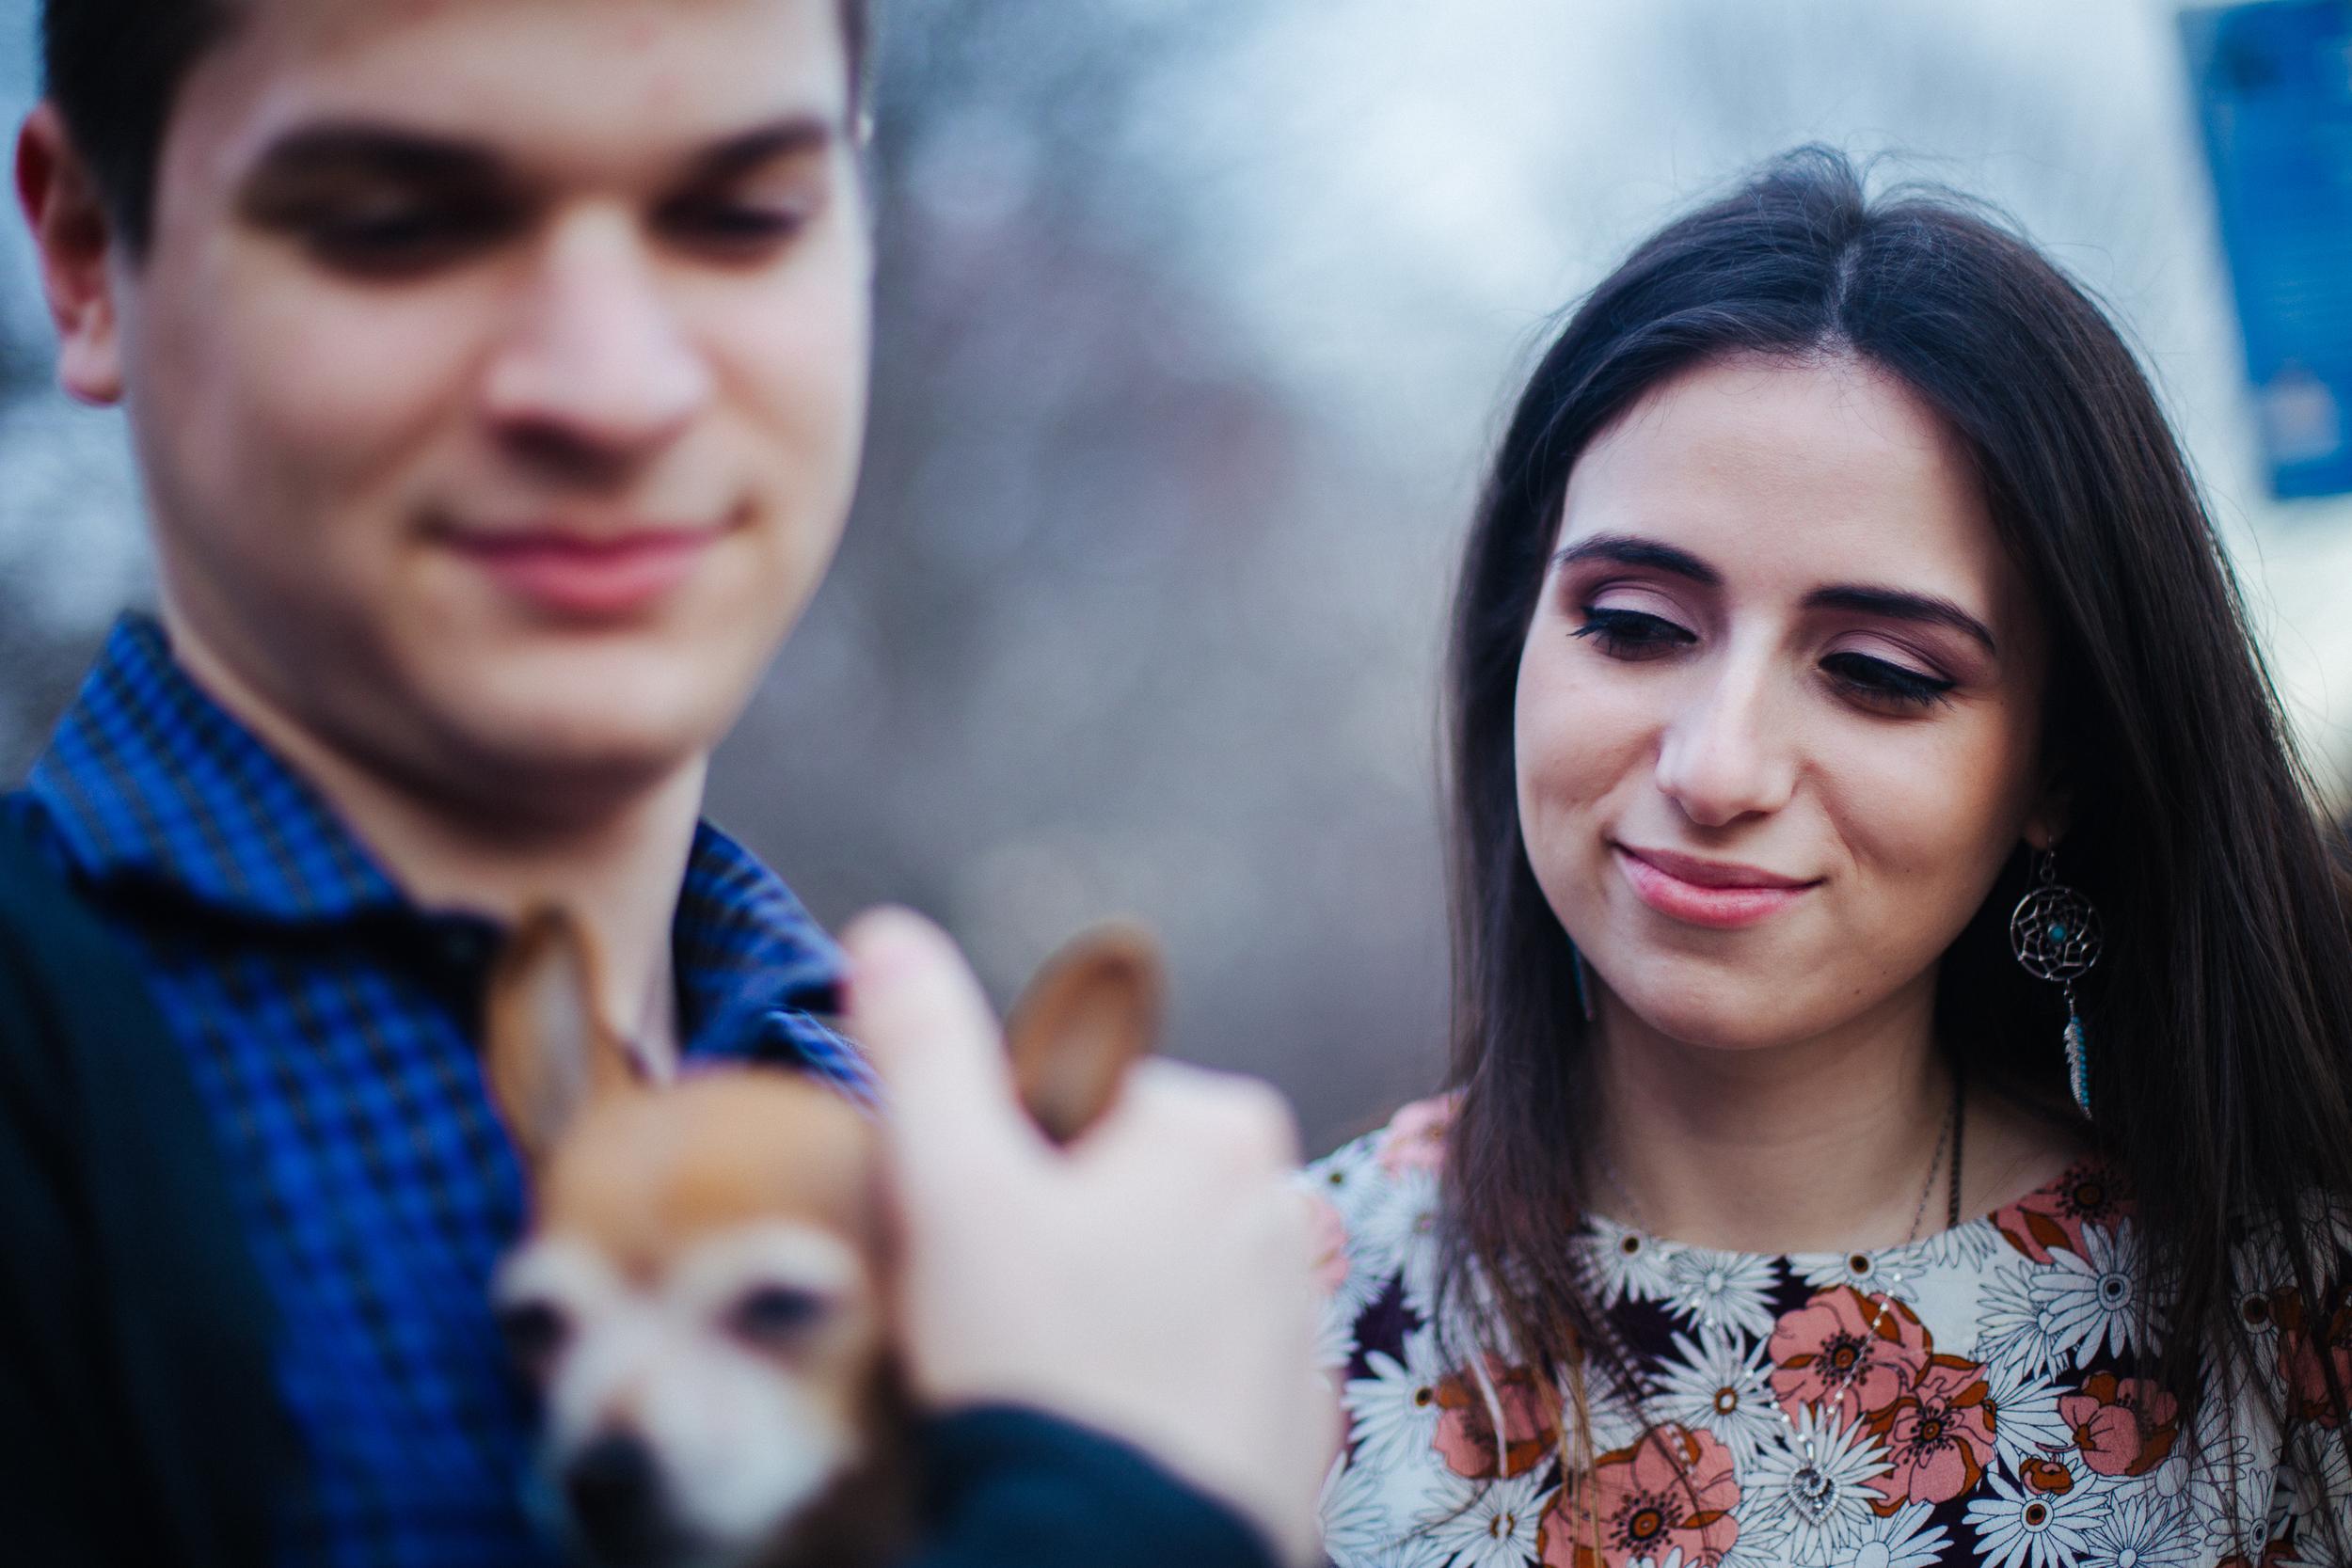 Avi & Yehudis - Engagement Session  - Eliau Piha studio photography, new york, events, people-0118.jpg